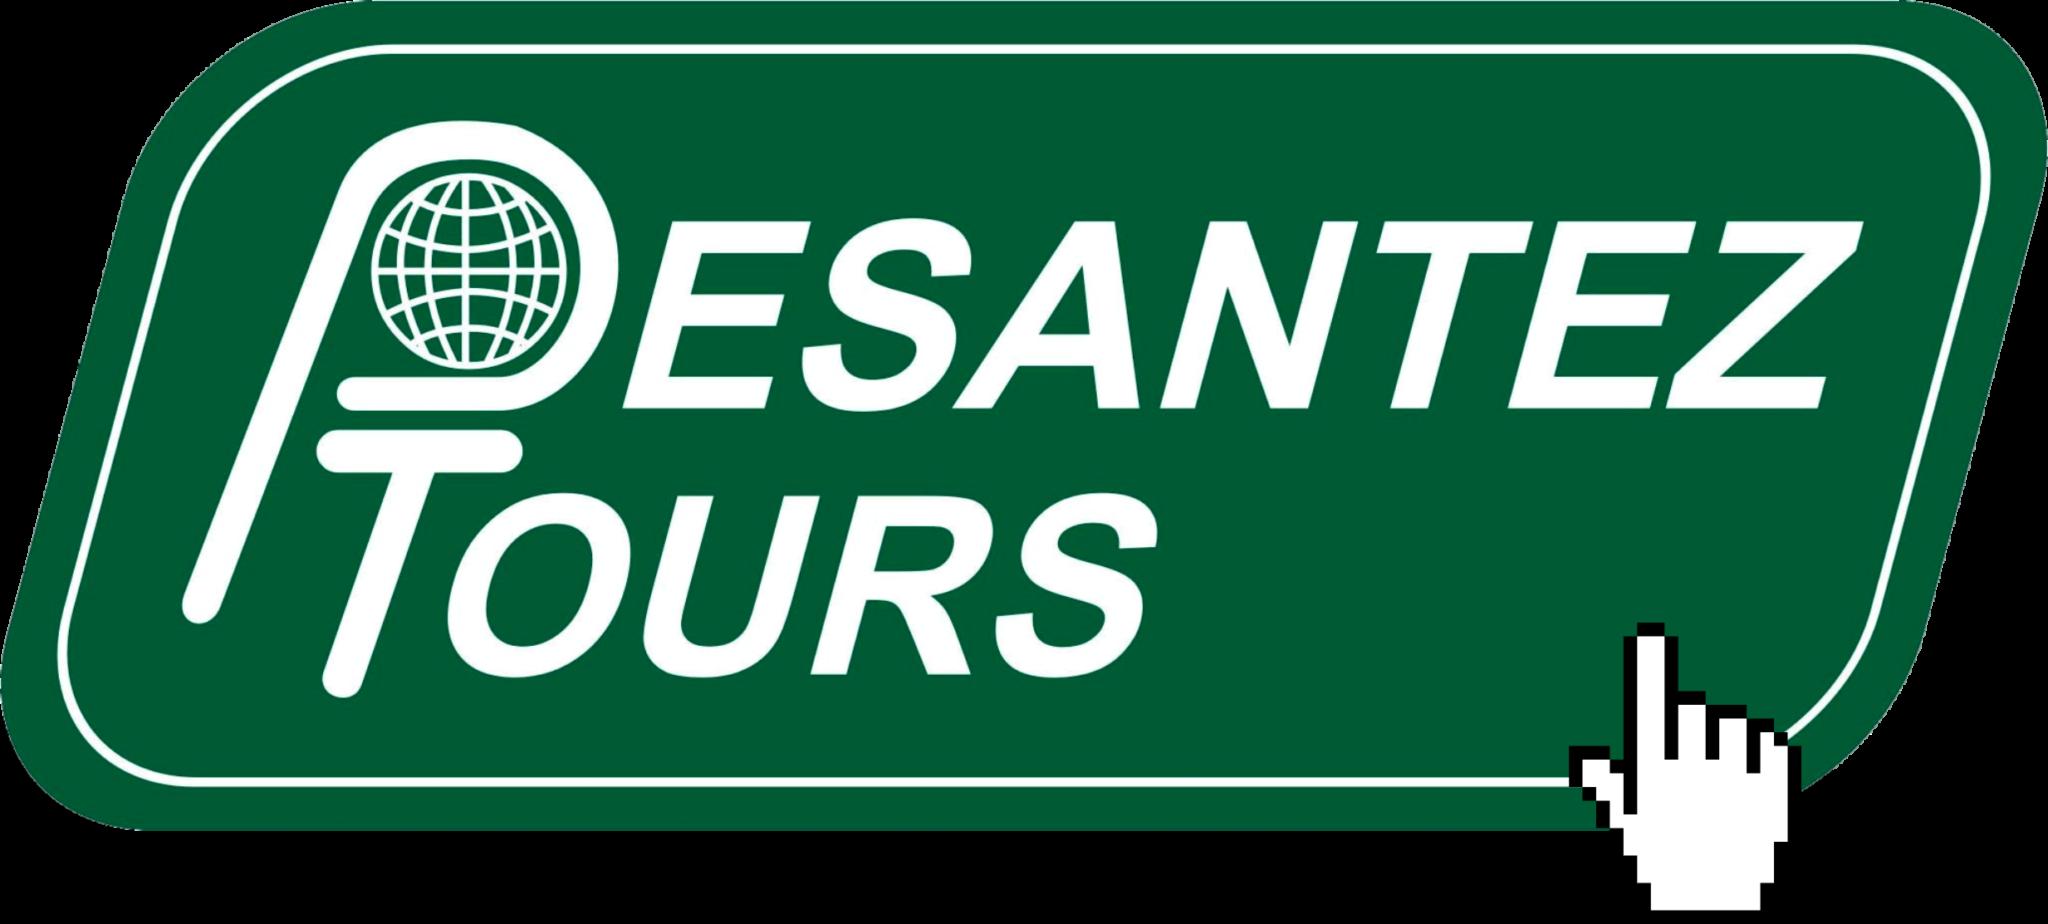 Pesantez-Tours